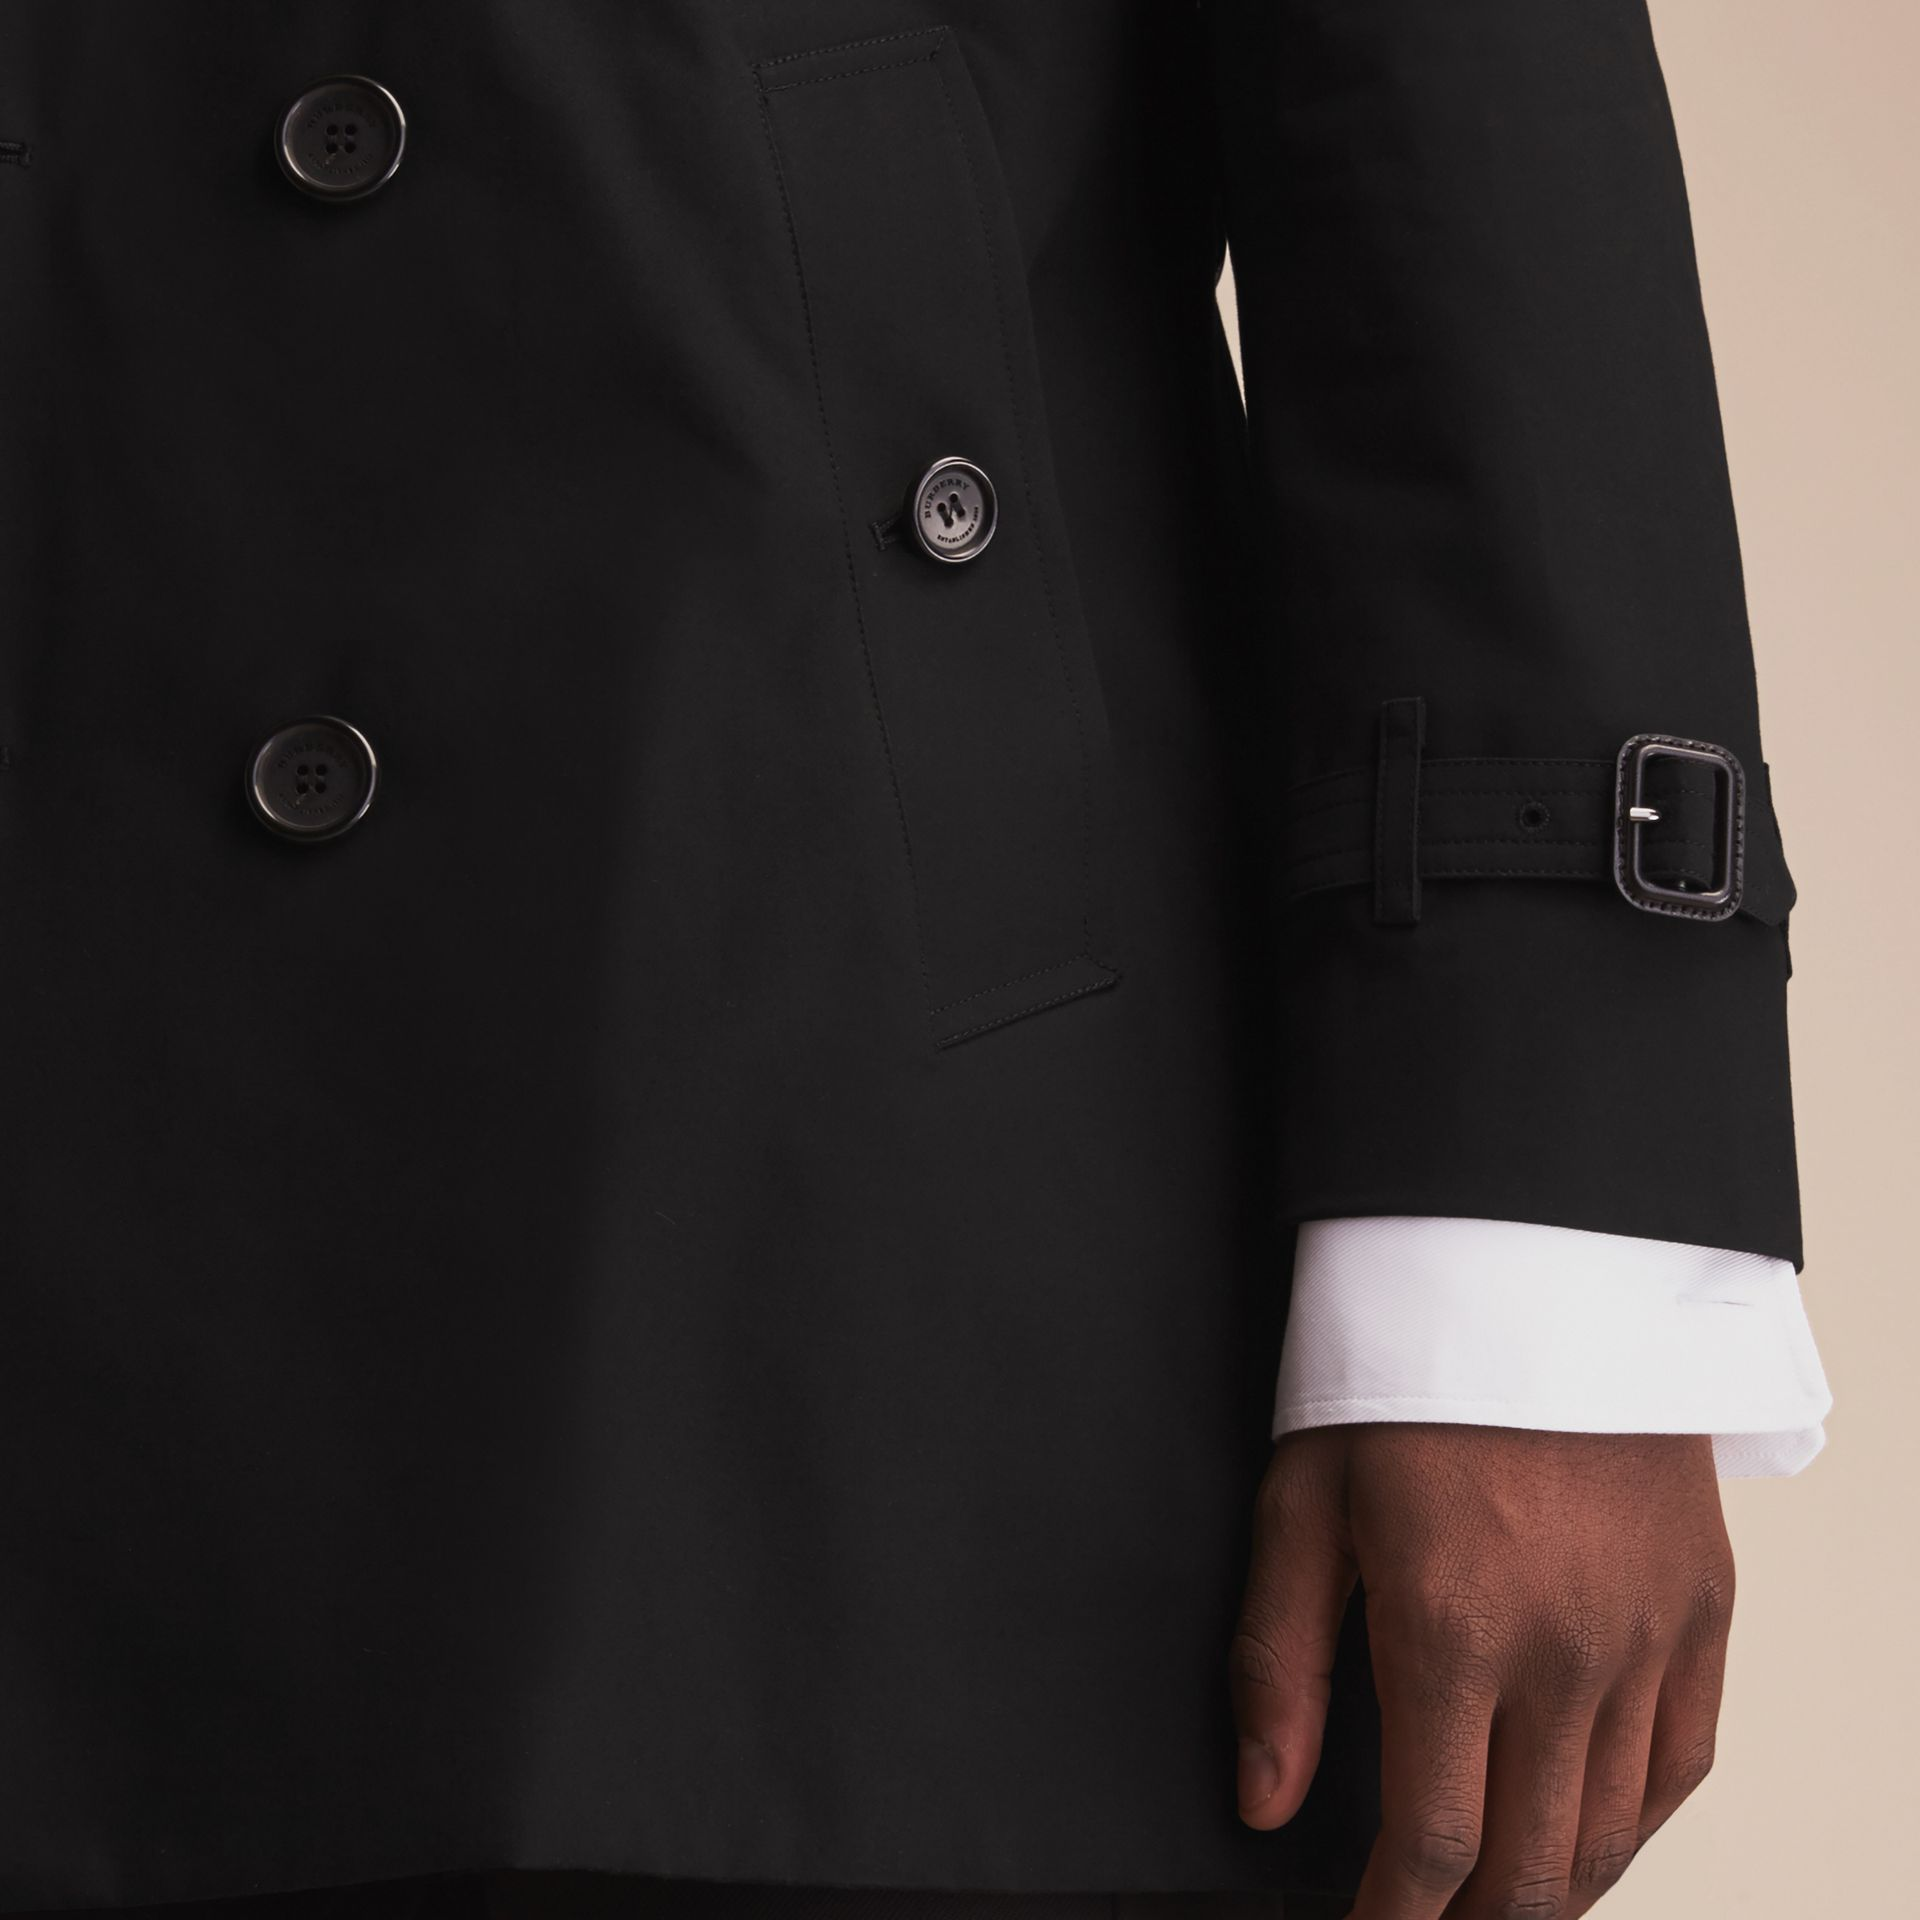 Preto The Sandringham - Trench coat Heritage médio Preto - galeria de imagens 8